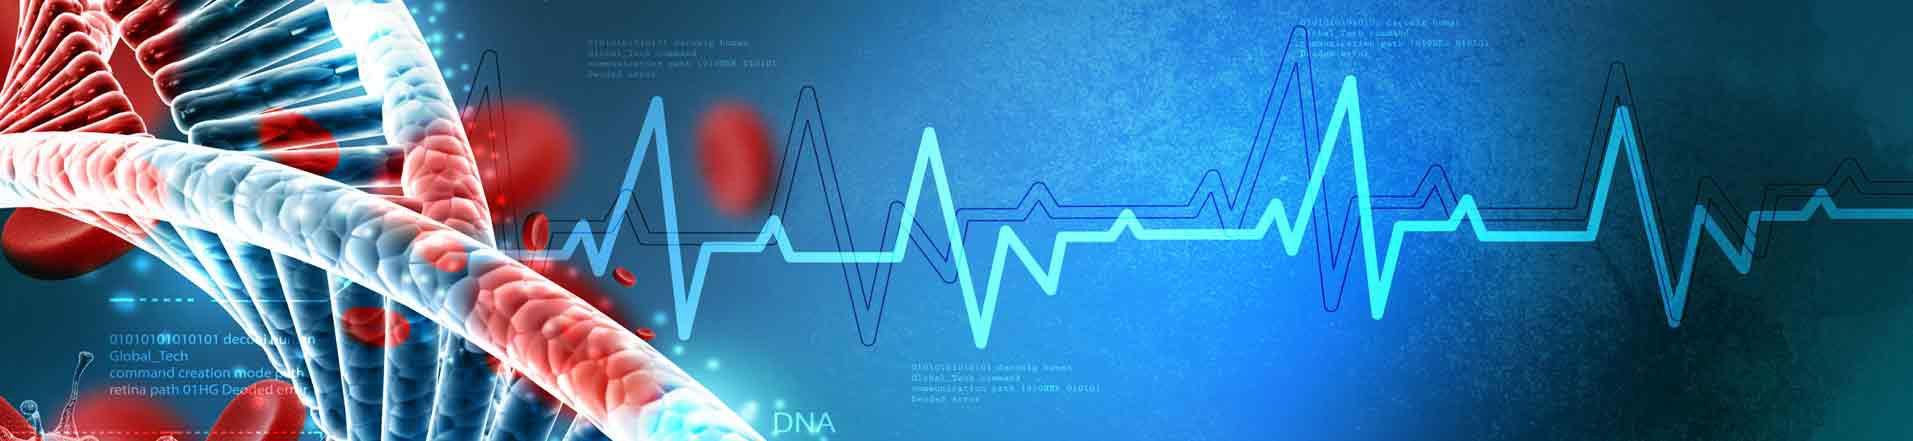 BtBs-UNIMIB-HEALTH-linea-di-ricerca